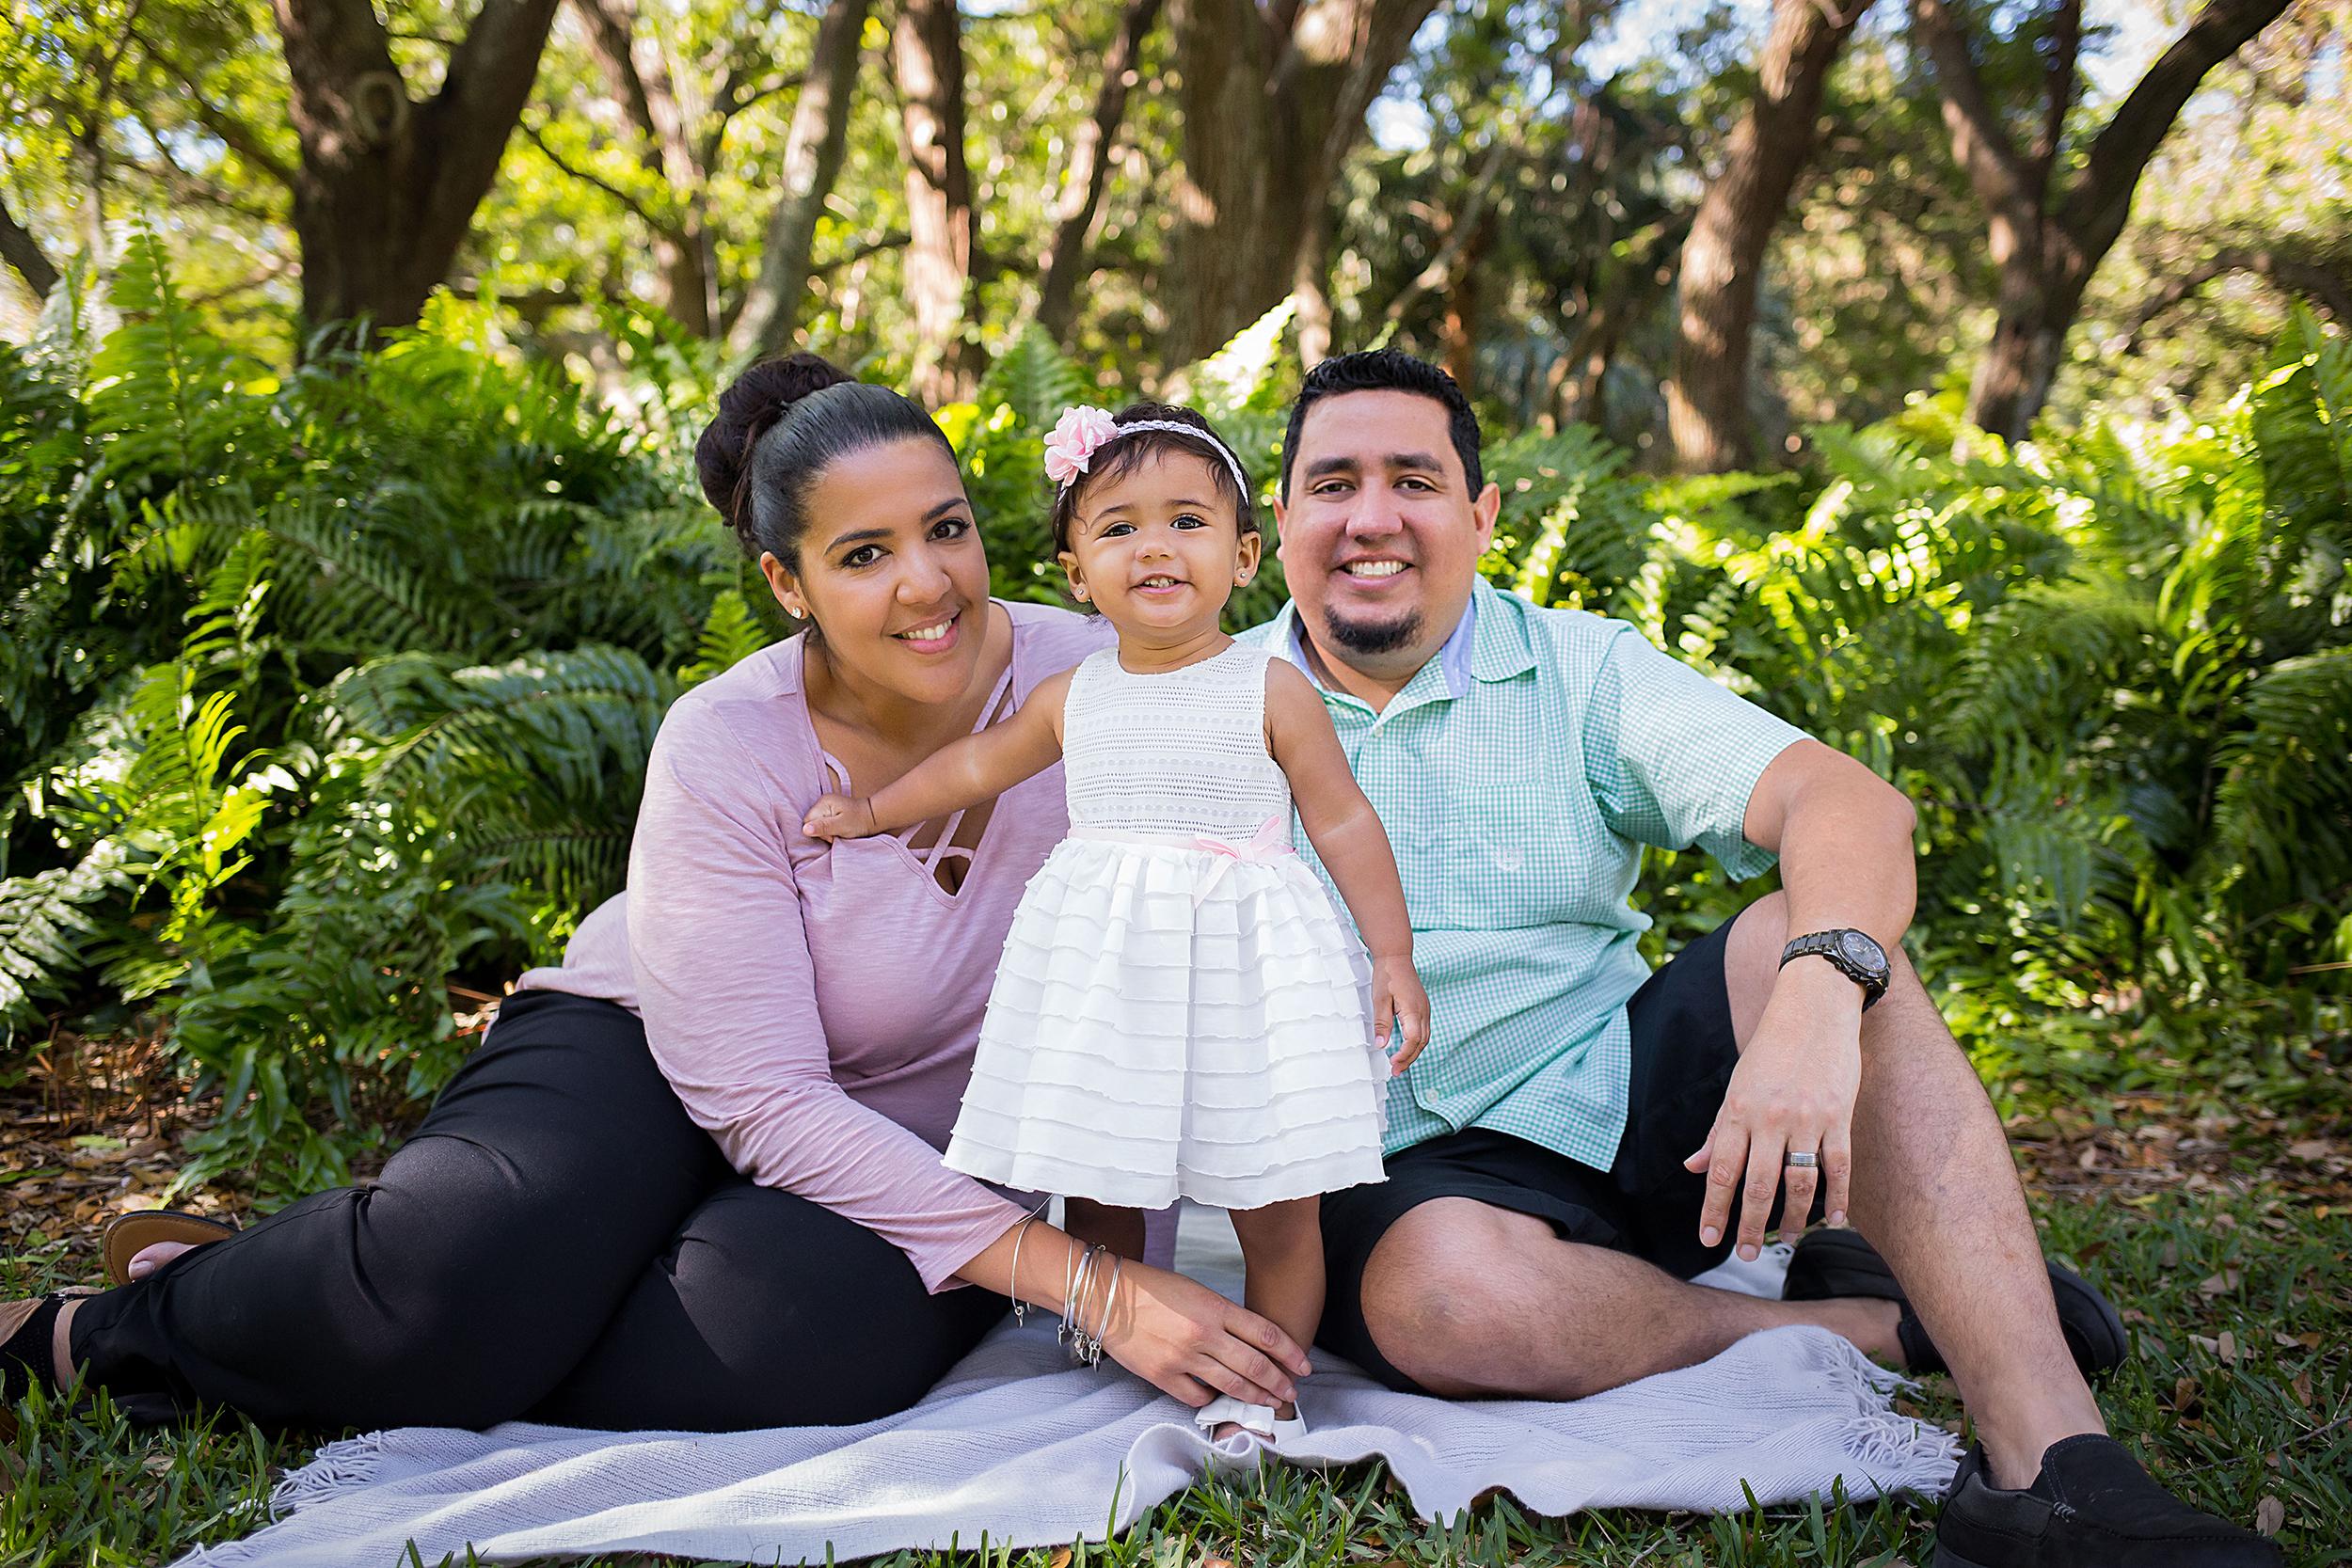 Deerfield-Beach-family-photographer.jpg